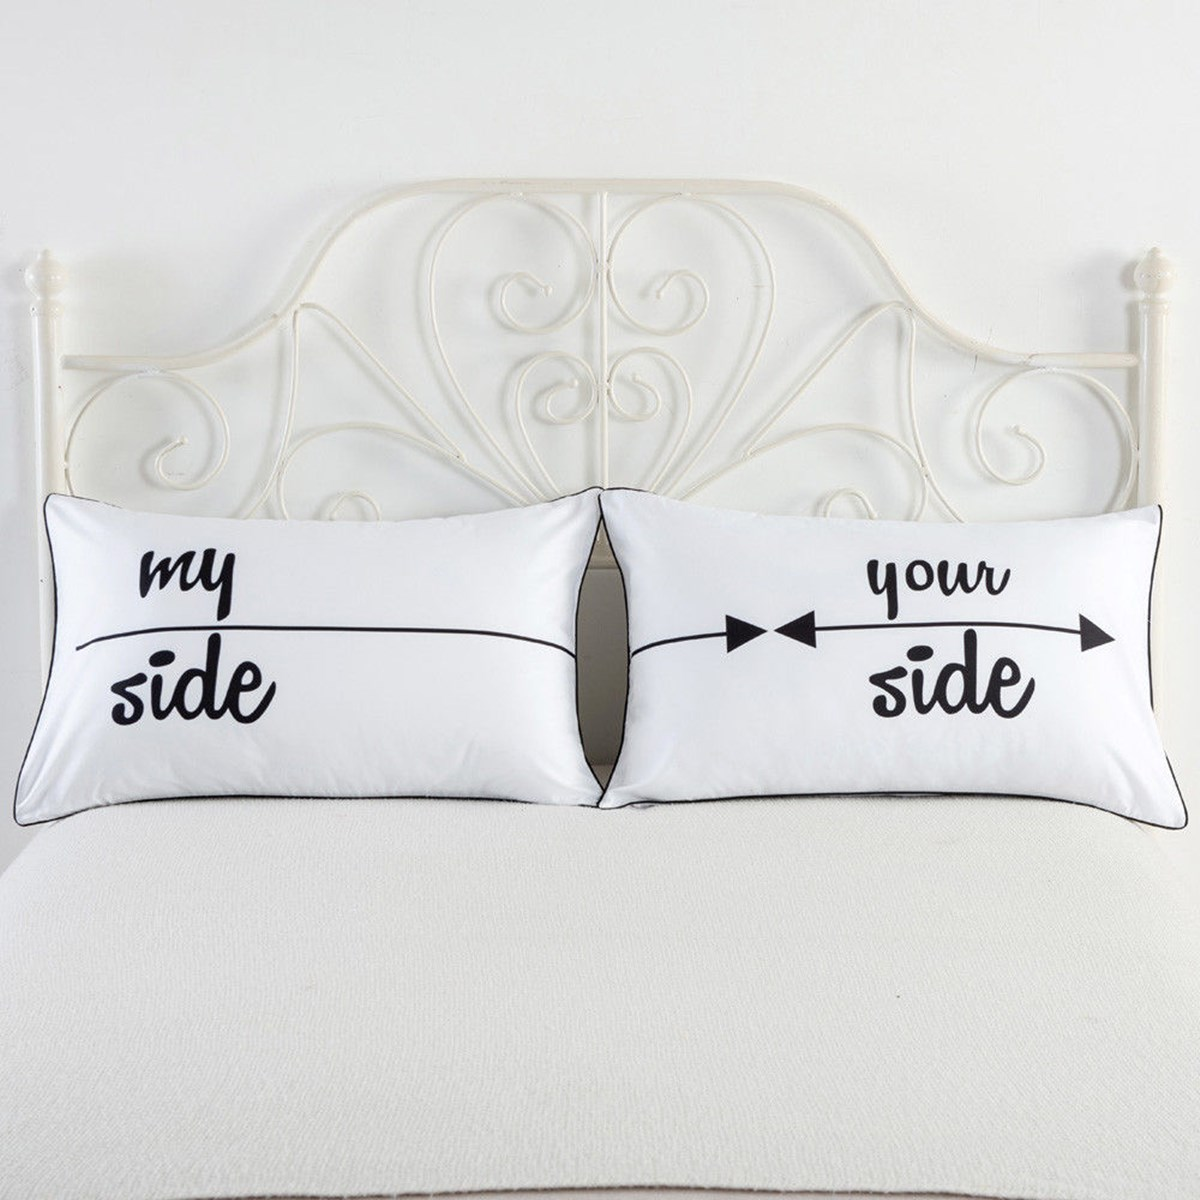 online get cheap couple pillow bedding aliexpresscom  alibaba group - white letters pillow cases pcs xcm couples pillow cases cushionrectangle home textiles bedding accessories(